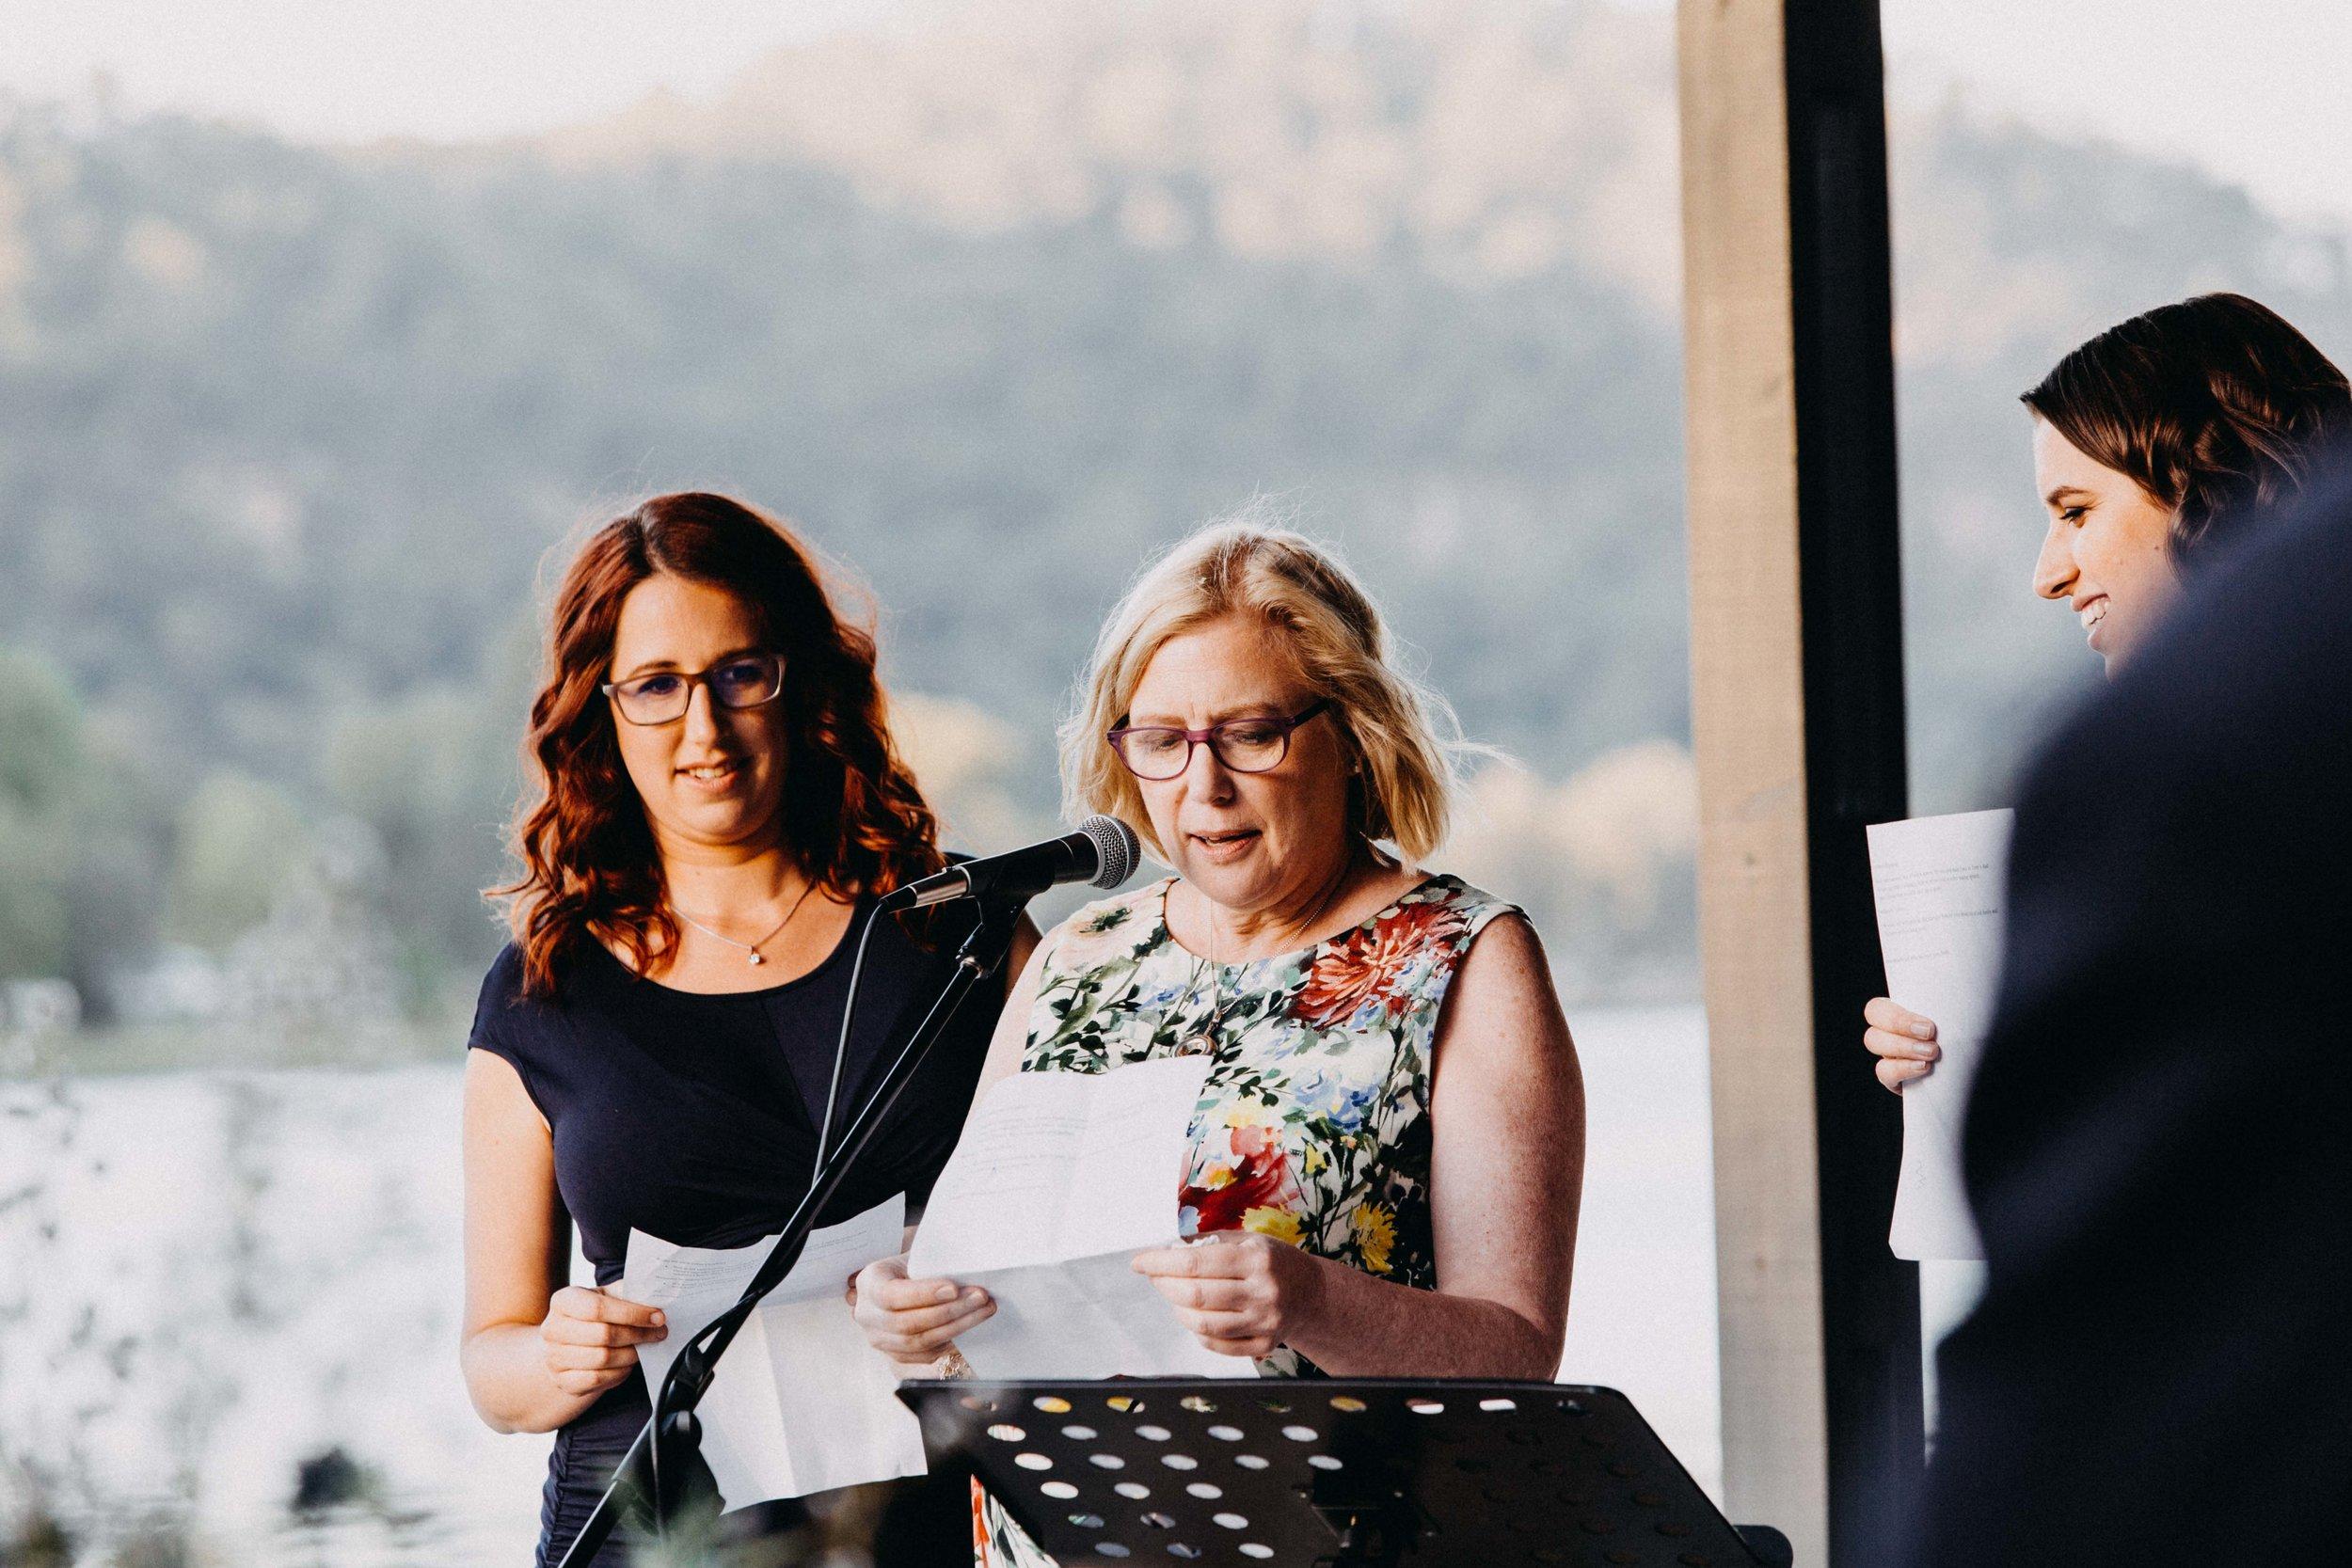 wisemans-ferry-wedding-www.emilyobrienphotography.net-94.jpg